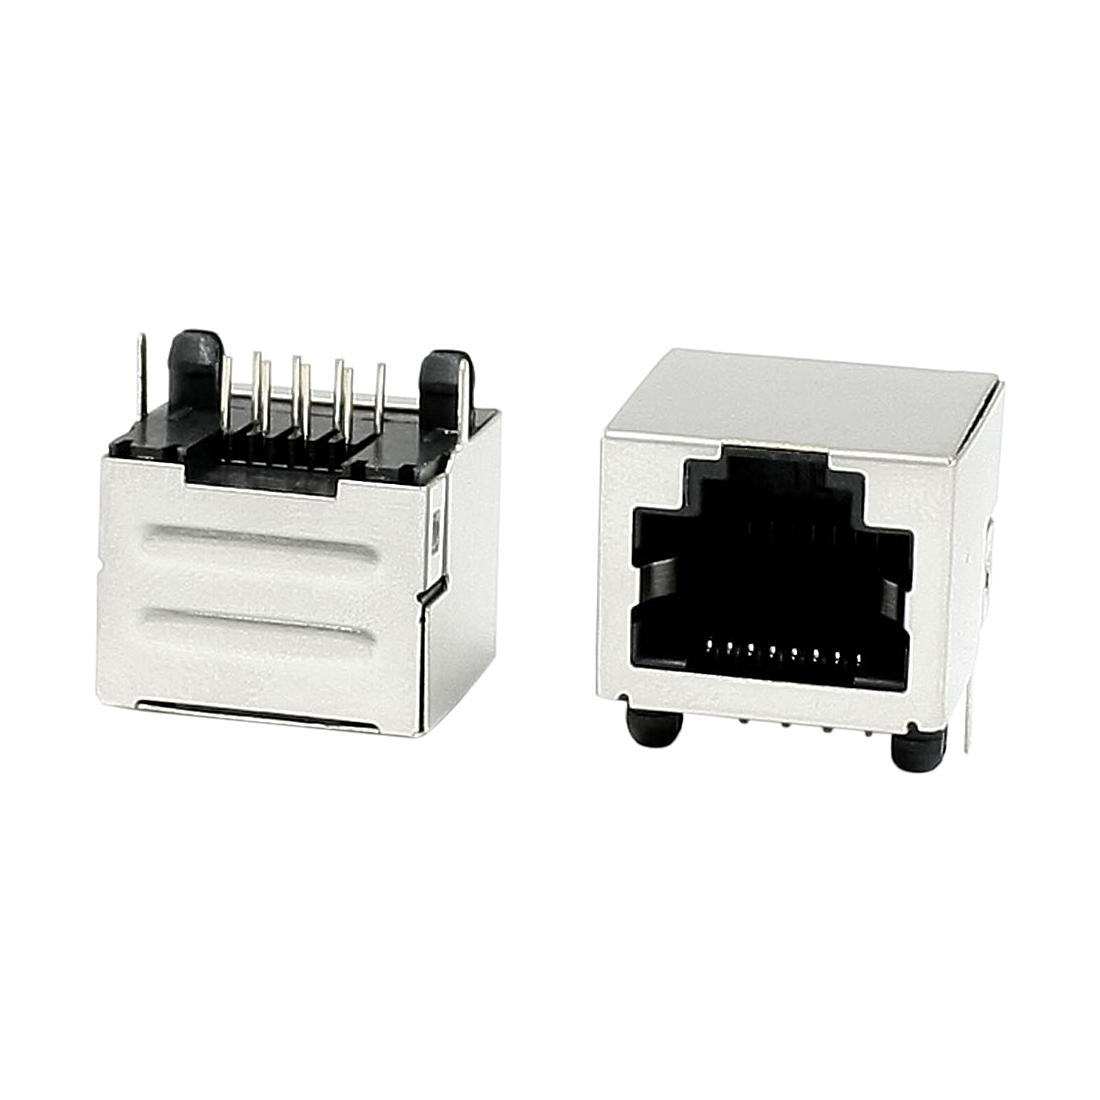 15 Pcs 8 Pins RJ45 PCB Horizontal Plug-in Type Jacks Sockets 15mm Length